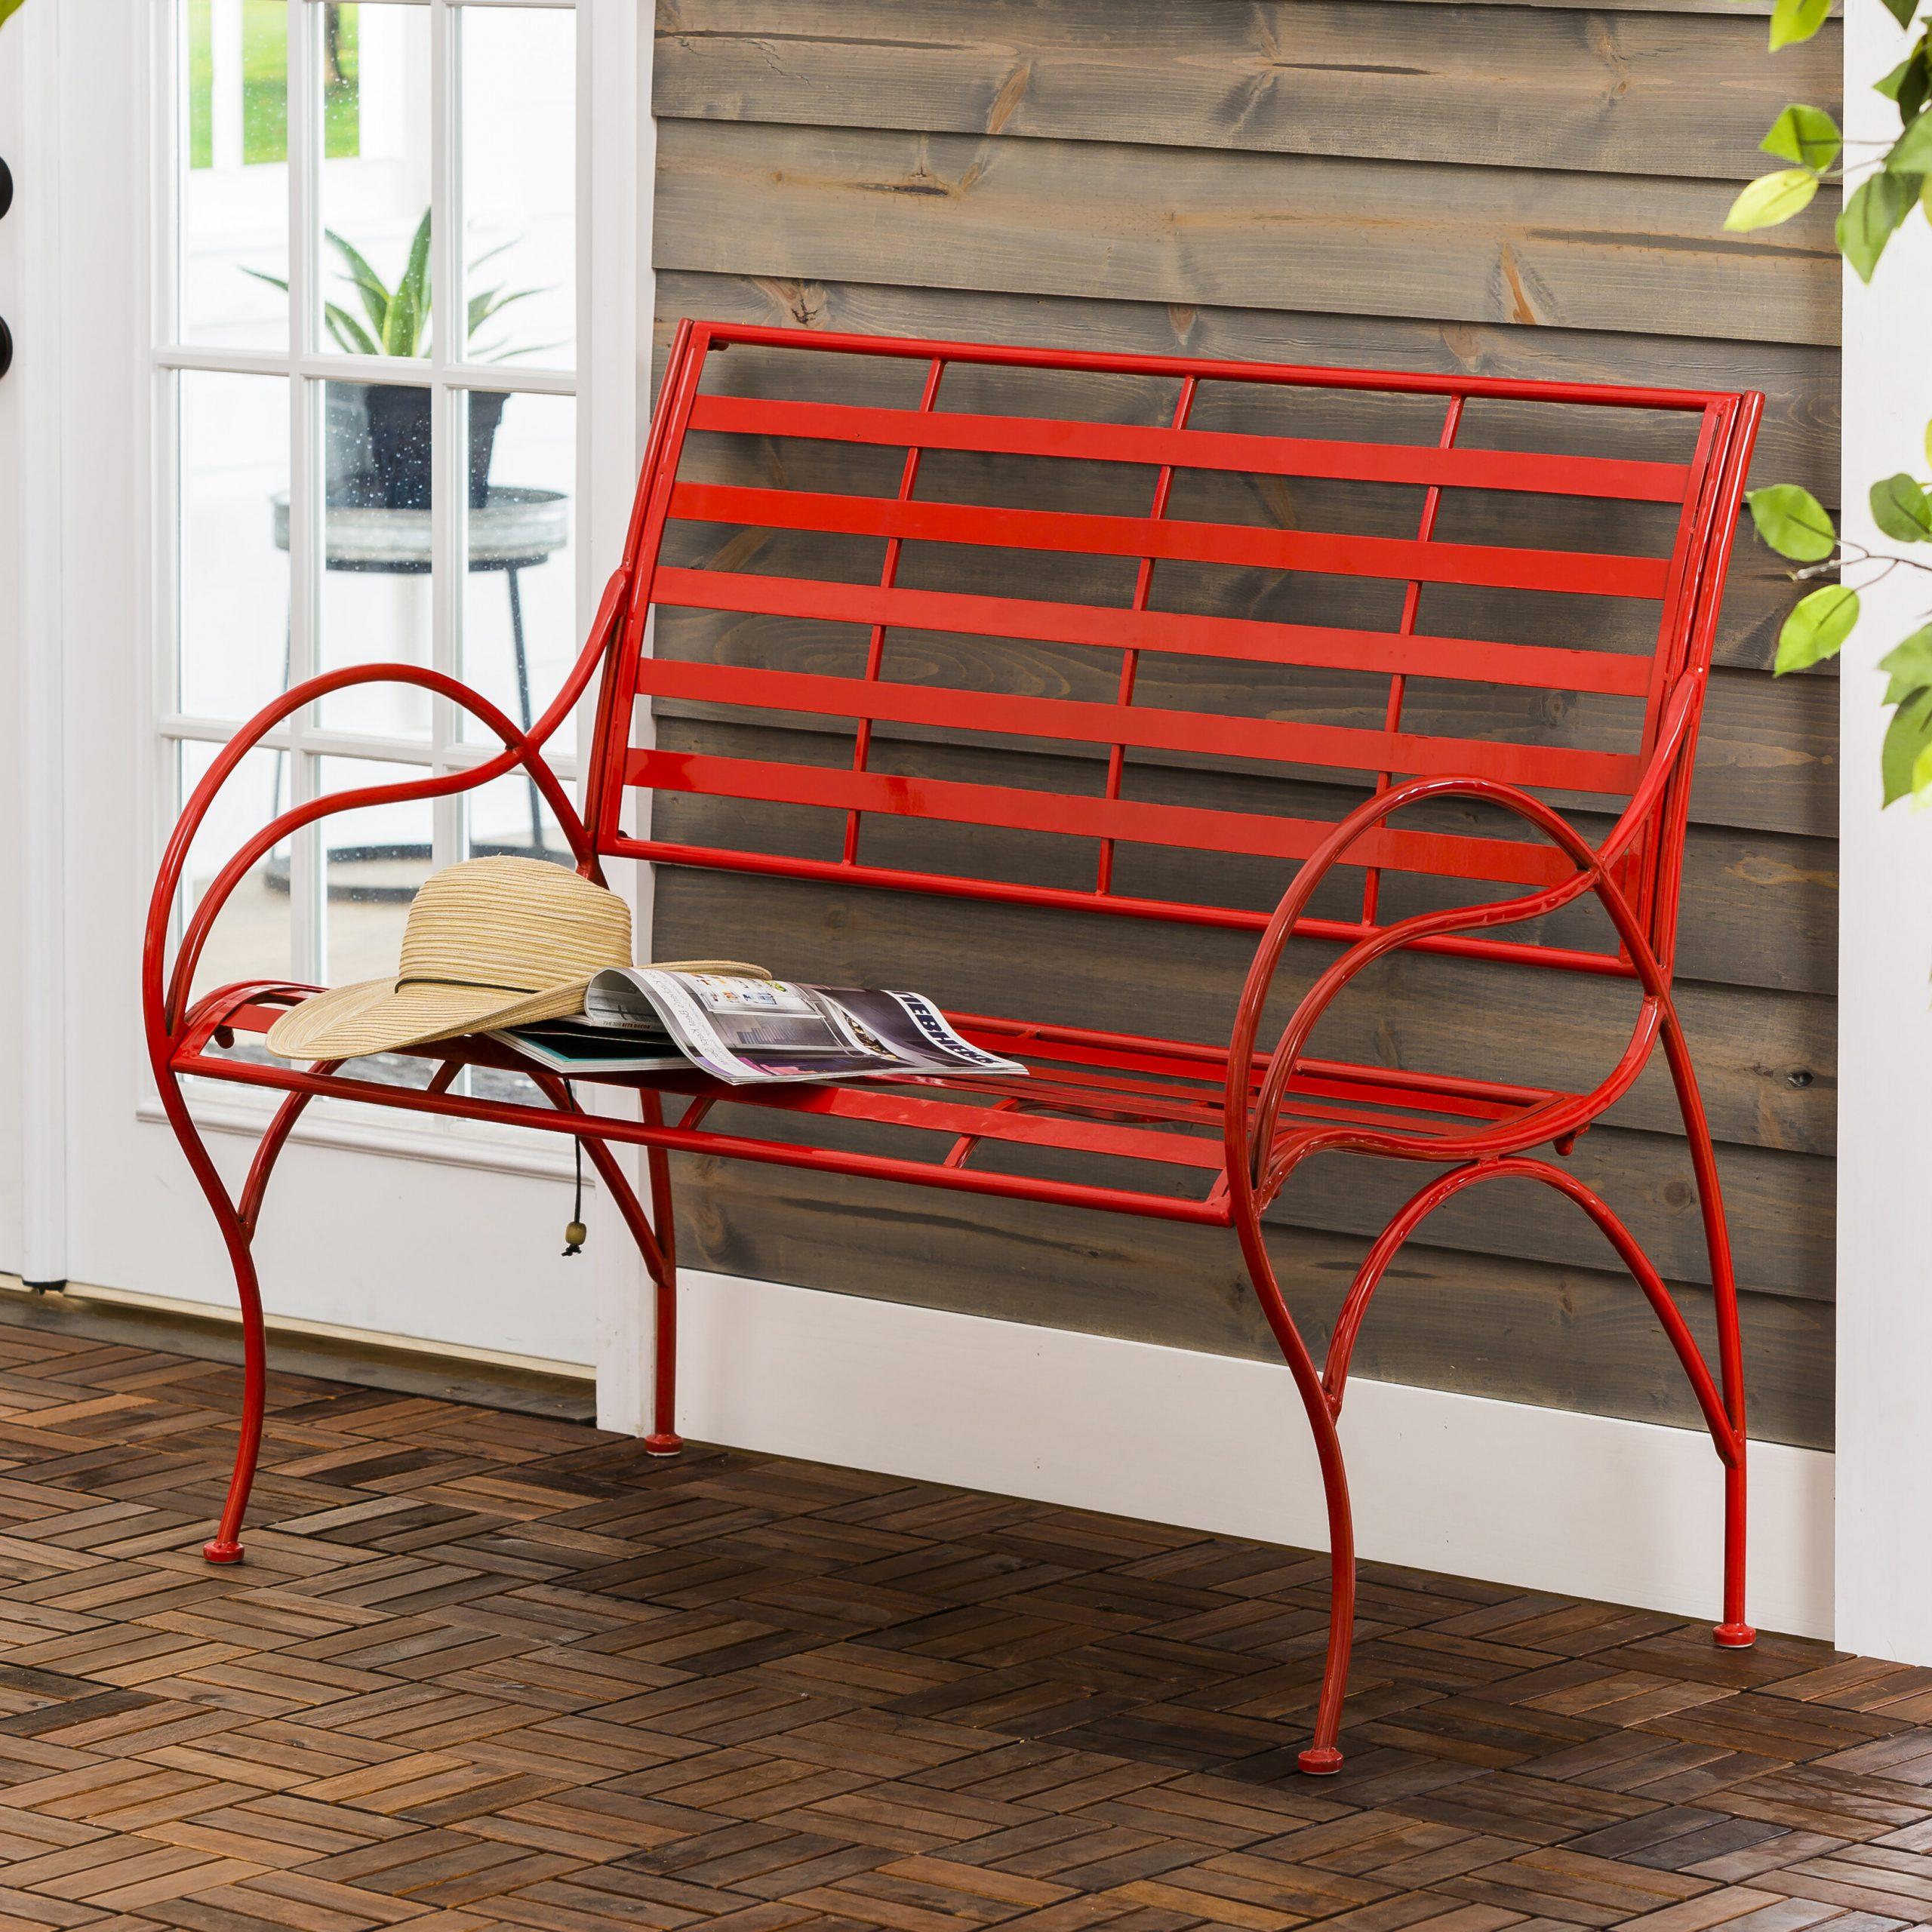 Norrie Metal Garden Benches Pertaining To Most Recent Carnegie Swirl Iron Garden Bench (View 3 of 30)